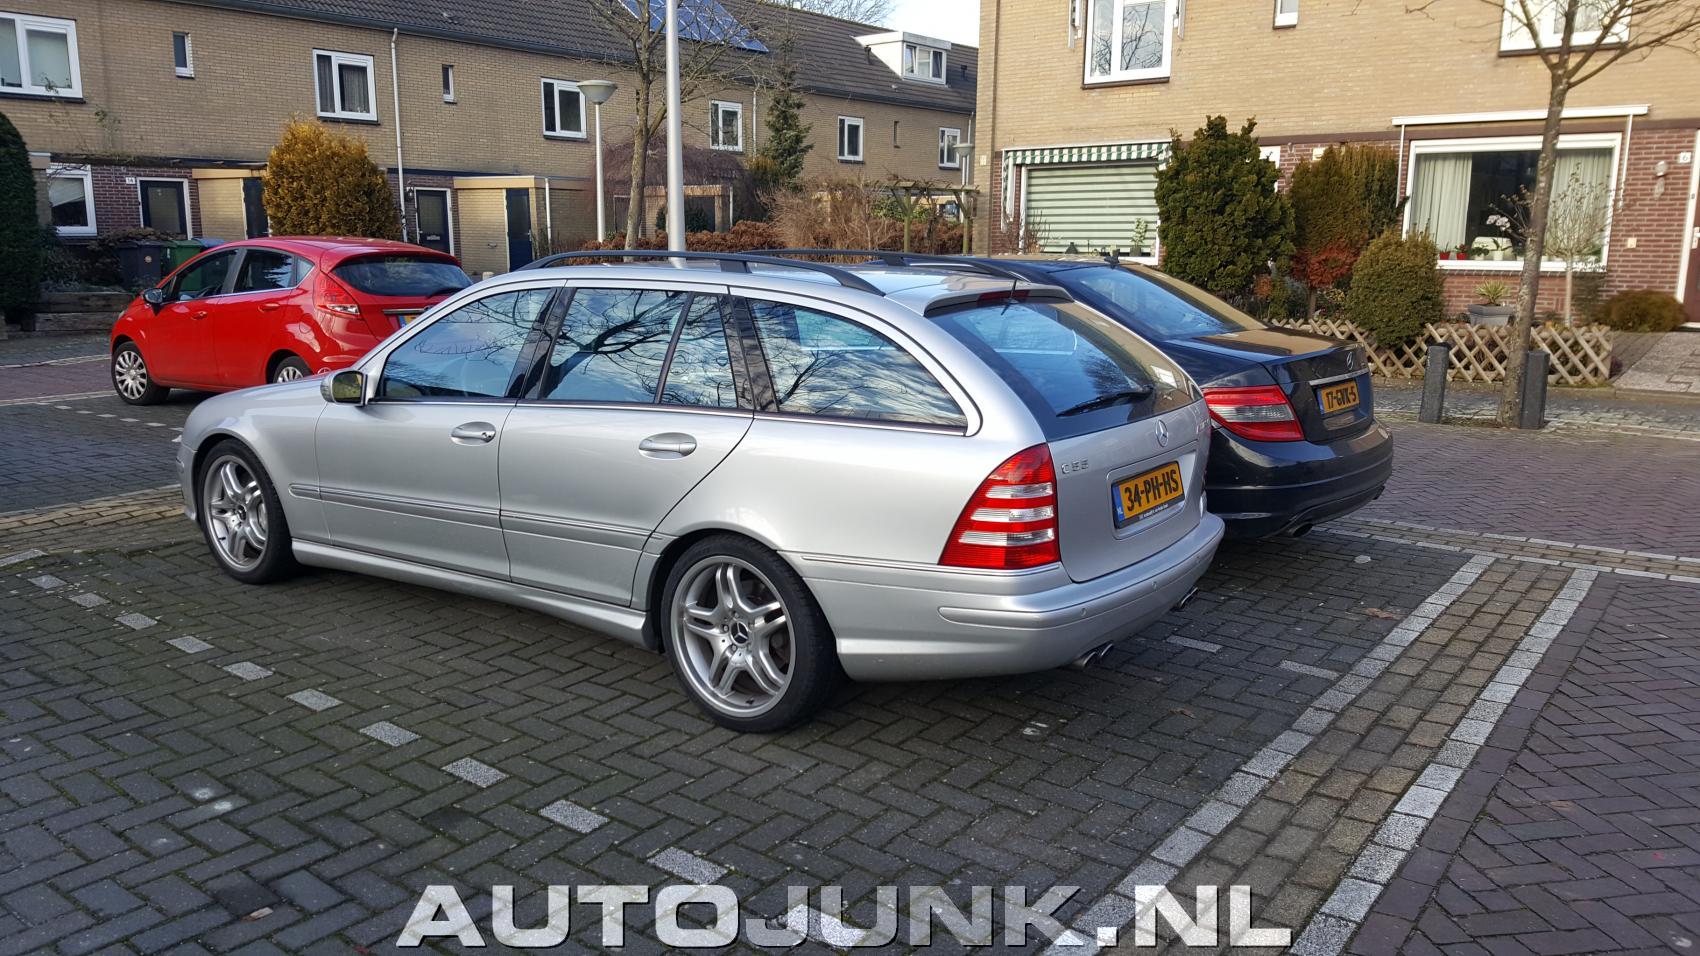 Mercedes benz c55 amg kombi w203 foto 39 s 187101 for Mercedes benz c55 amg